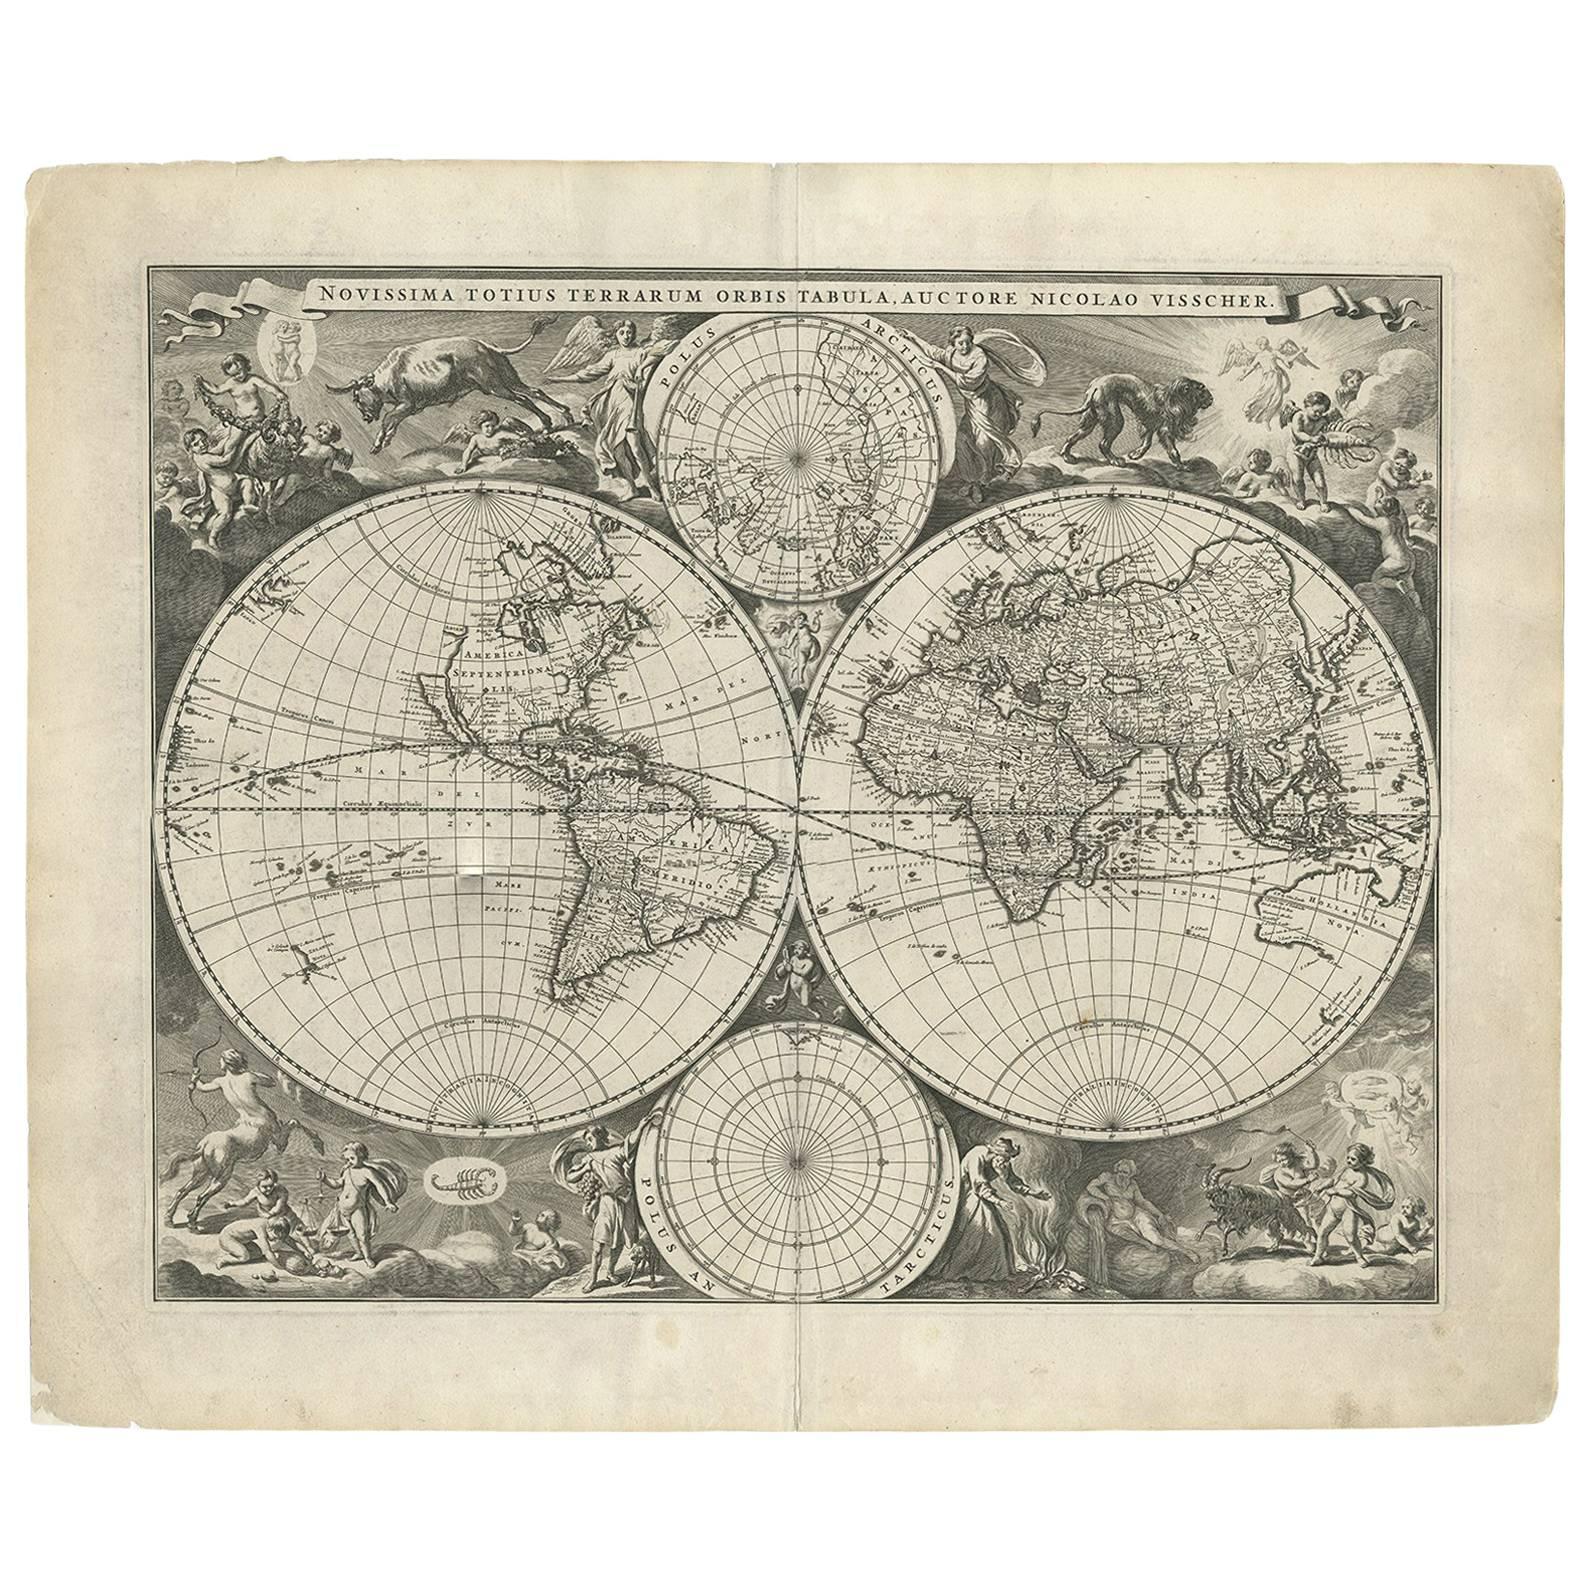 Antique World Map by N. Visscher circa 1679